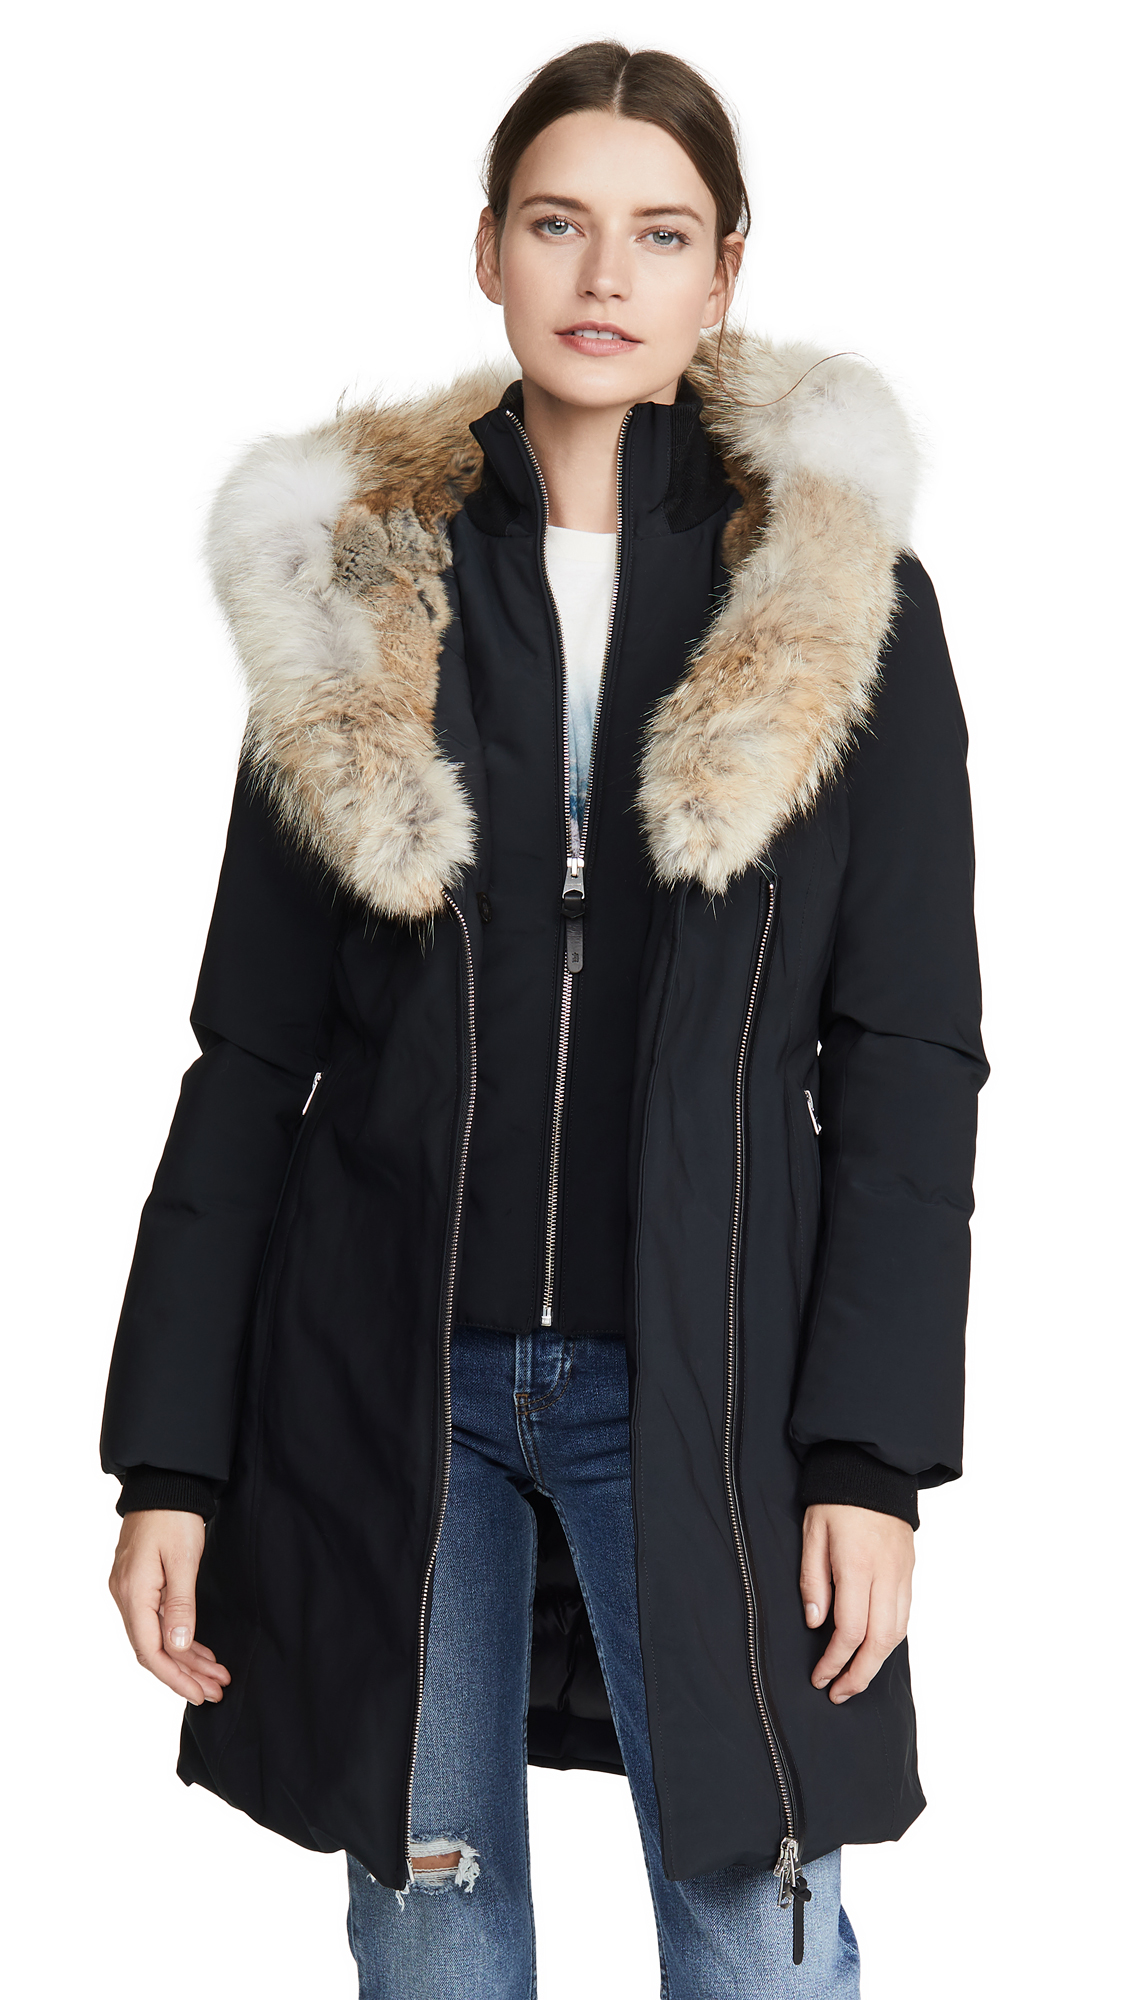 Buy Mackage Trish Parka online beautiful Mackage Jackets, Coats, Down Jackets